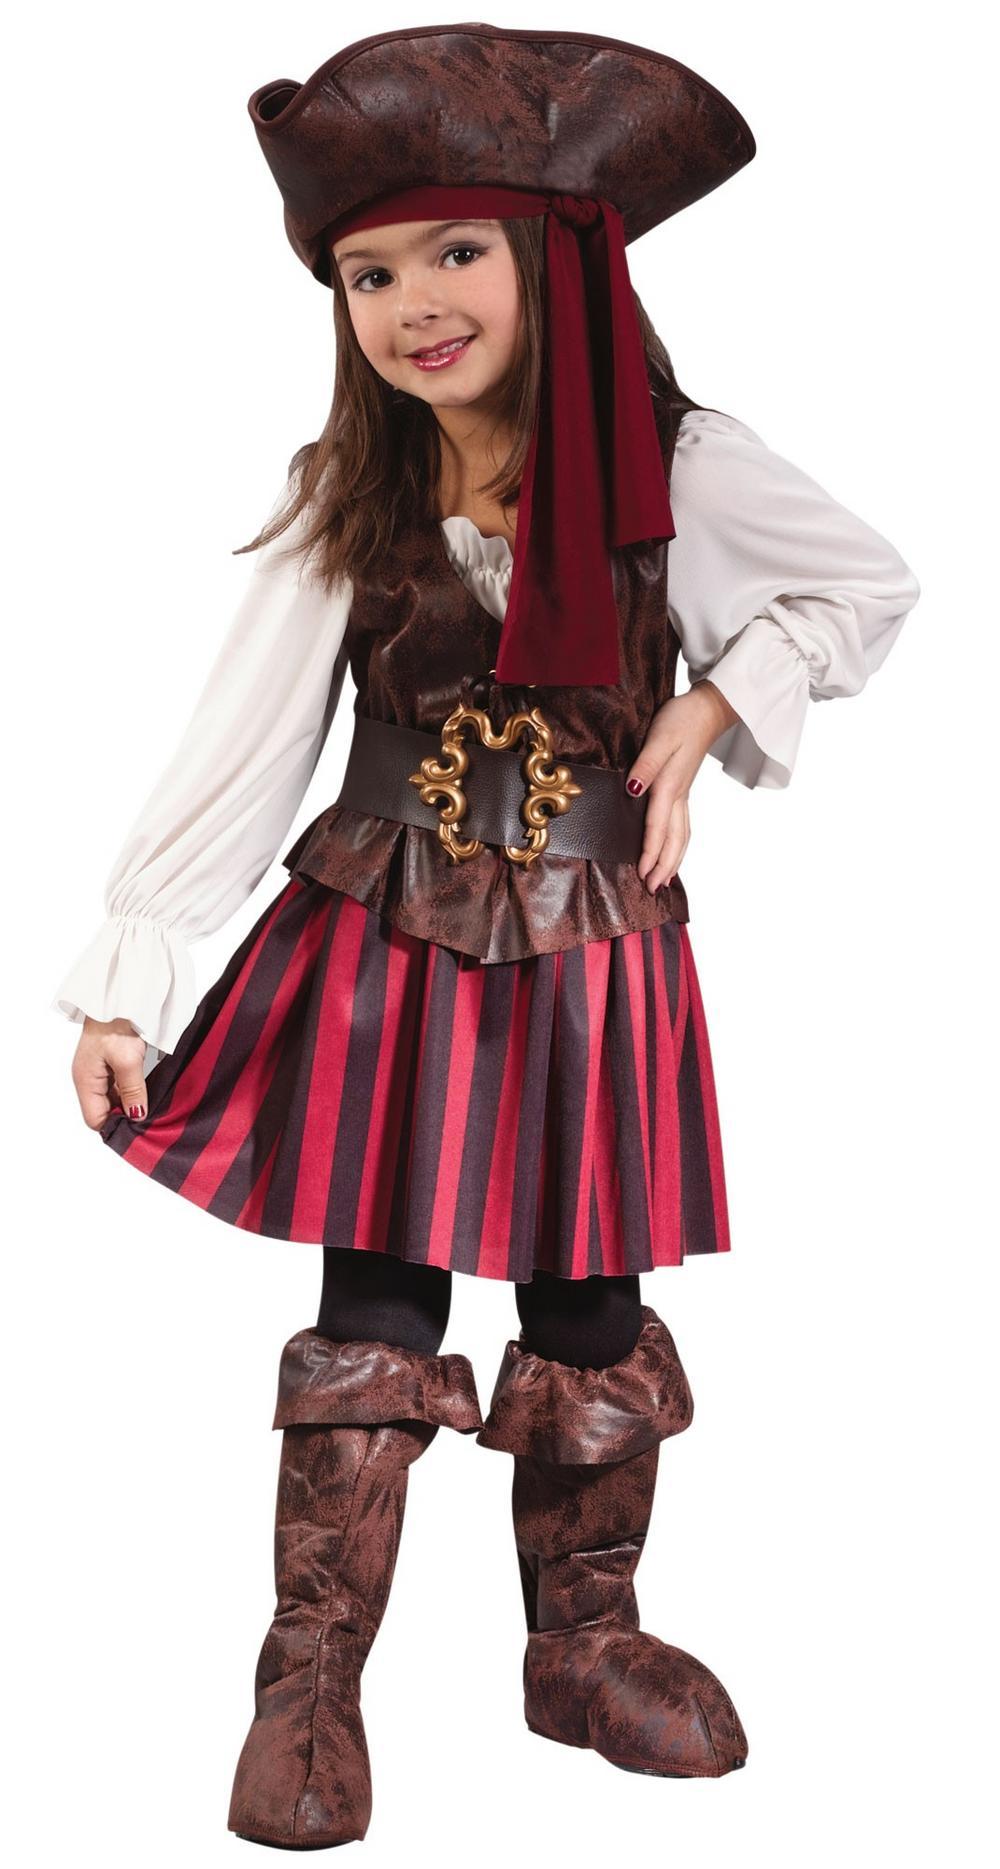 HighSeas Buccaneer Girl Toddler Costume